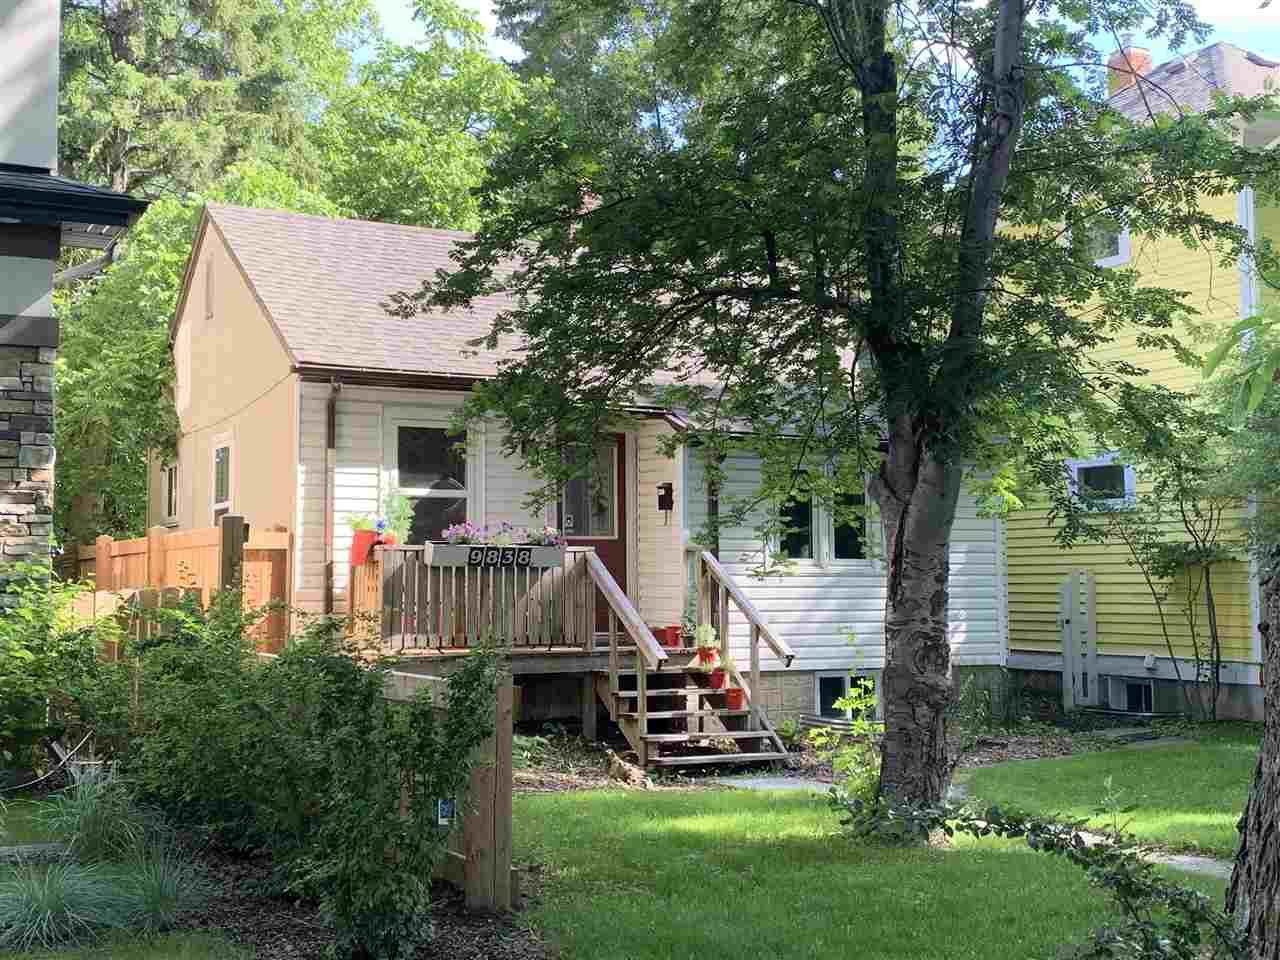 Main Photo: 9838 90 Avenue in Edmonton: Zone 15 House for sale : MLS®# E4220066